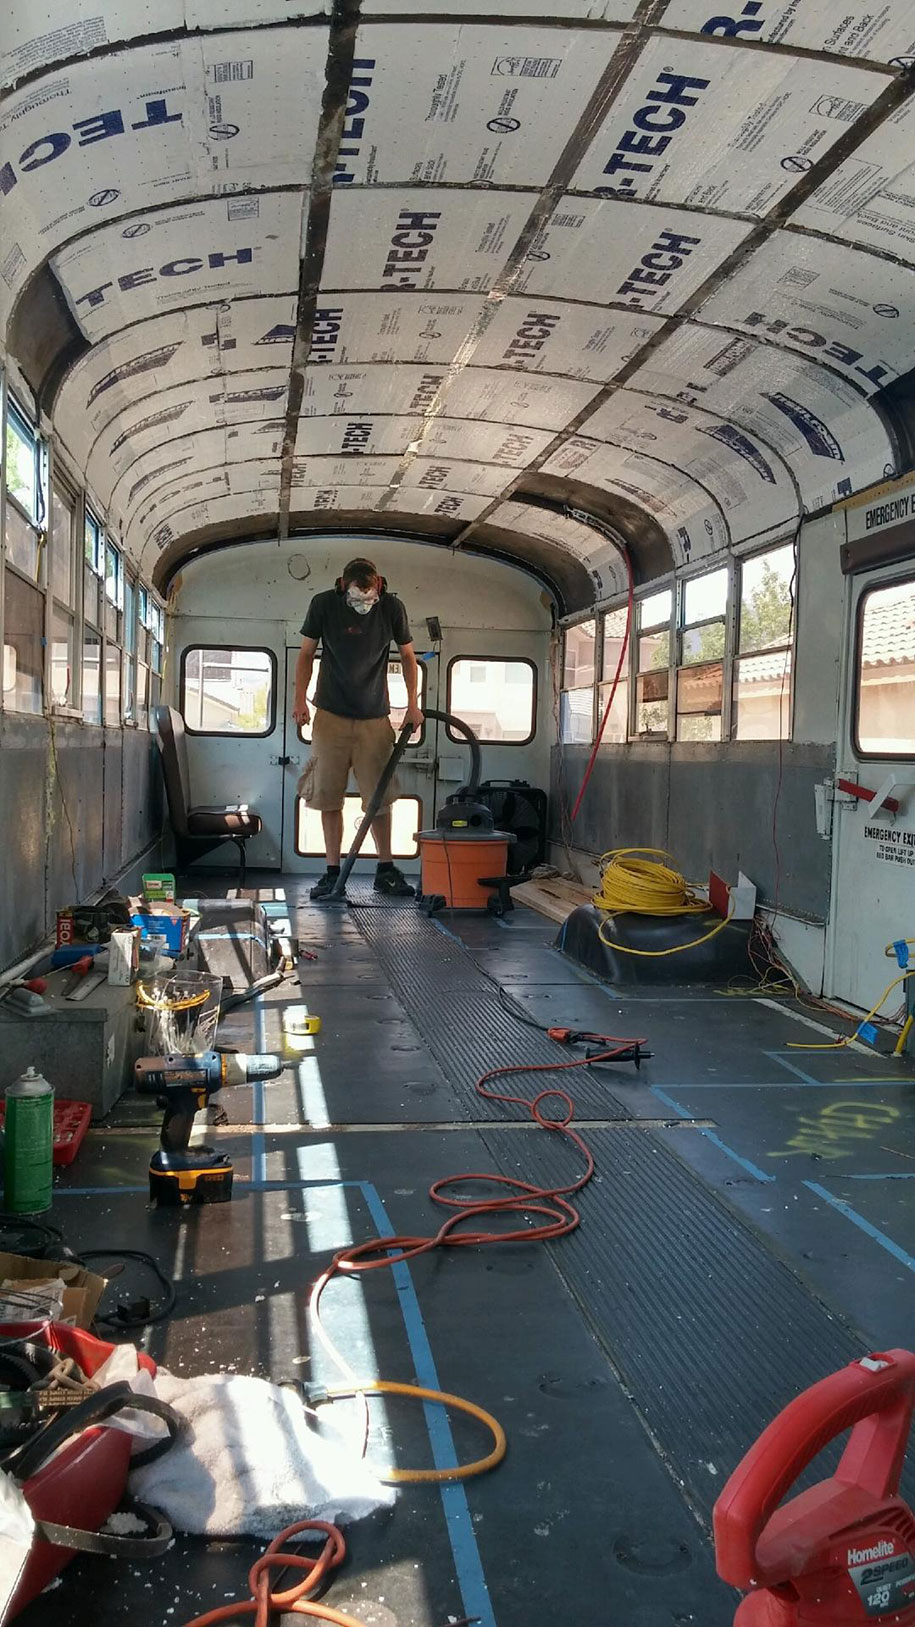 mobile-school-bus-home-travel-patrick-schmidt-9